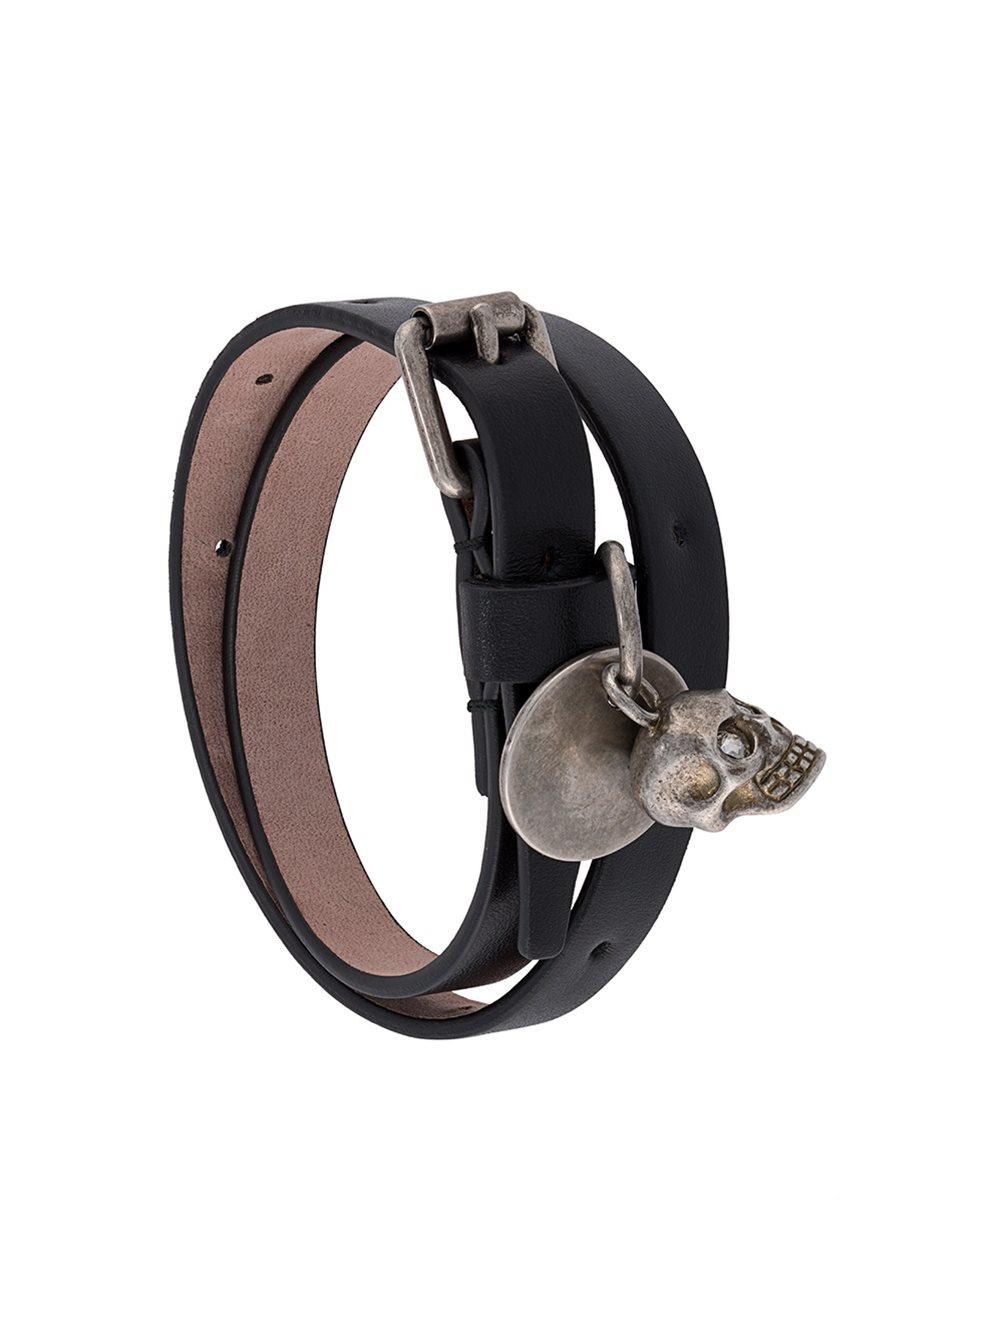 Alexander Mcqueen Double Wrap Skull Bracelet In Black For